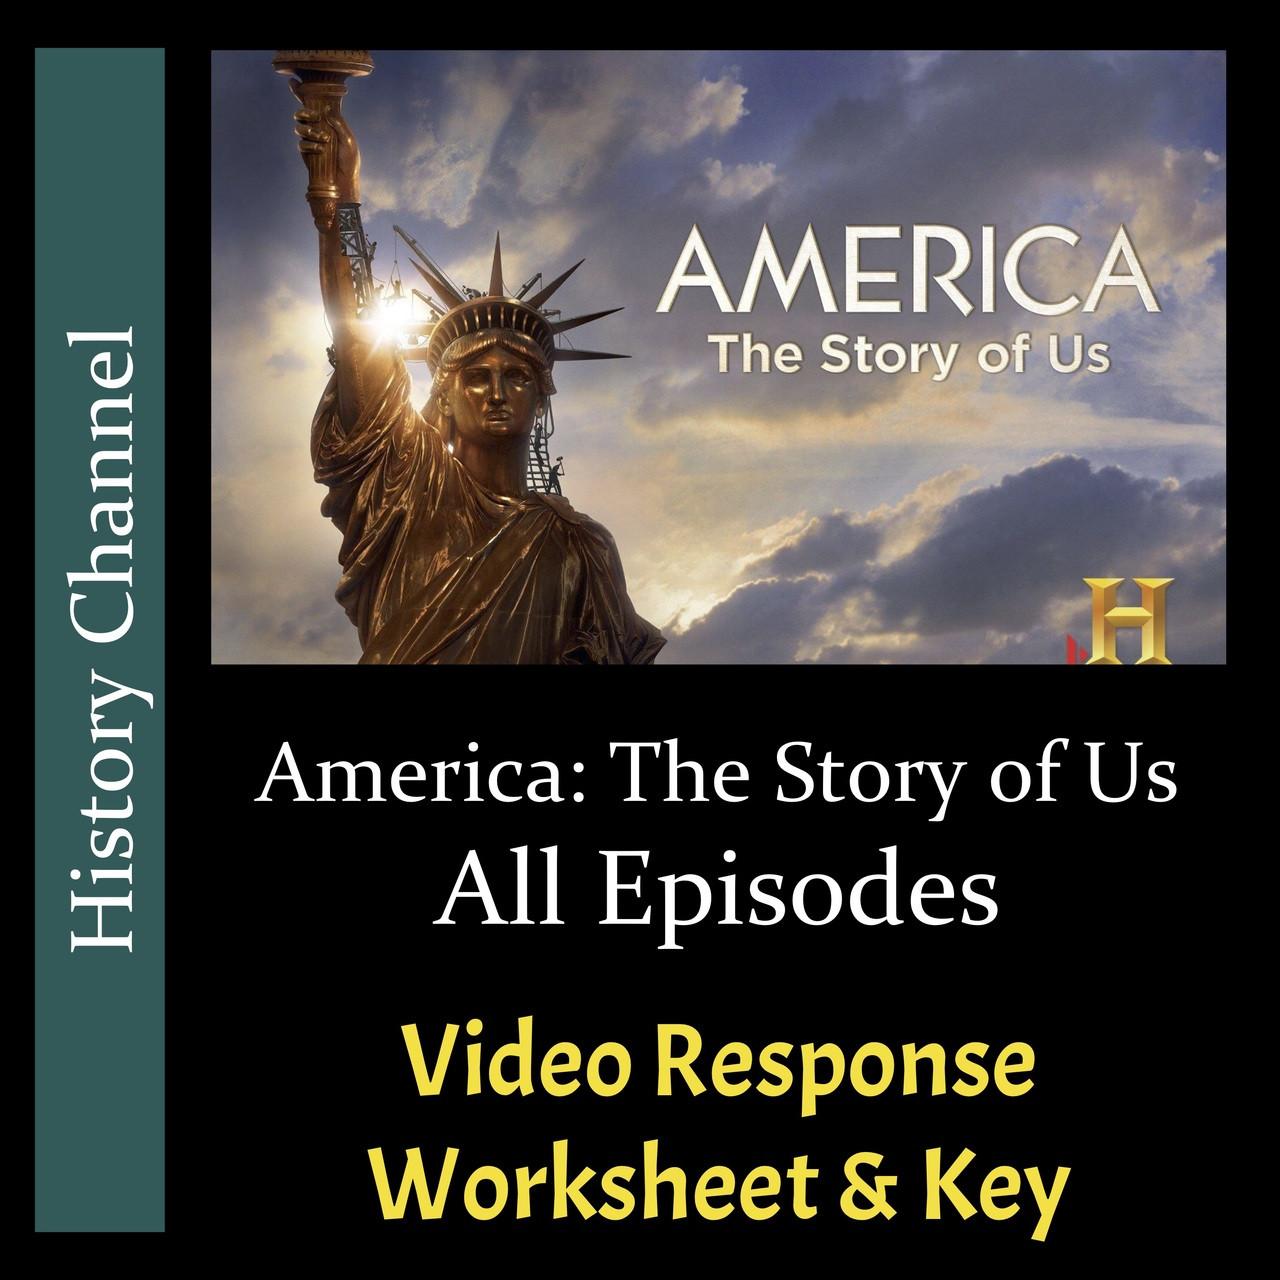 America The Story of Us - All Episode Bundle - Video Response Worksheets & Keys (Editable)